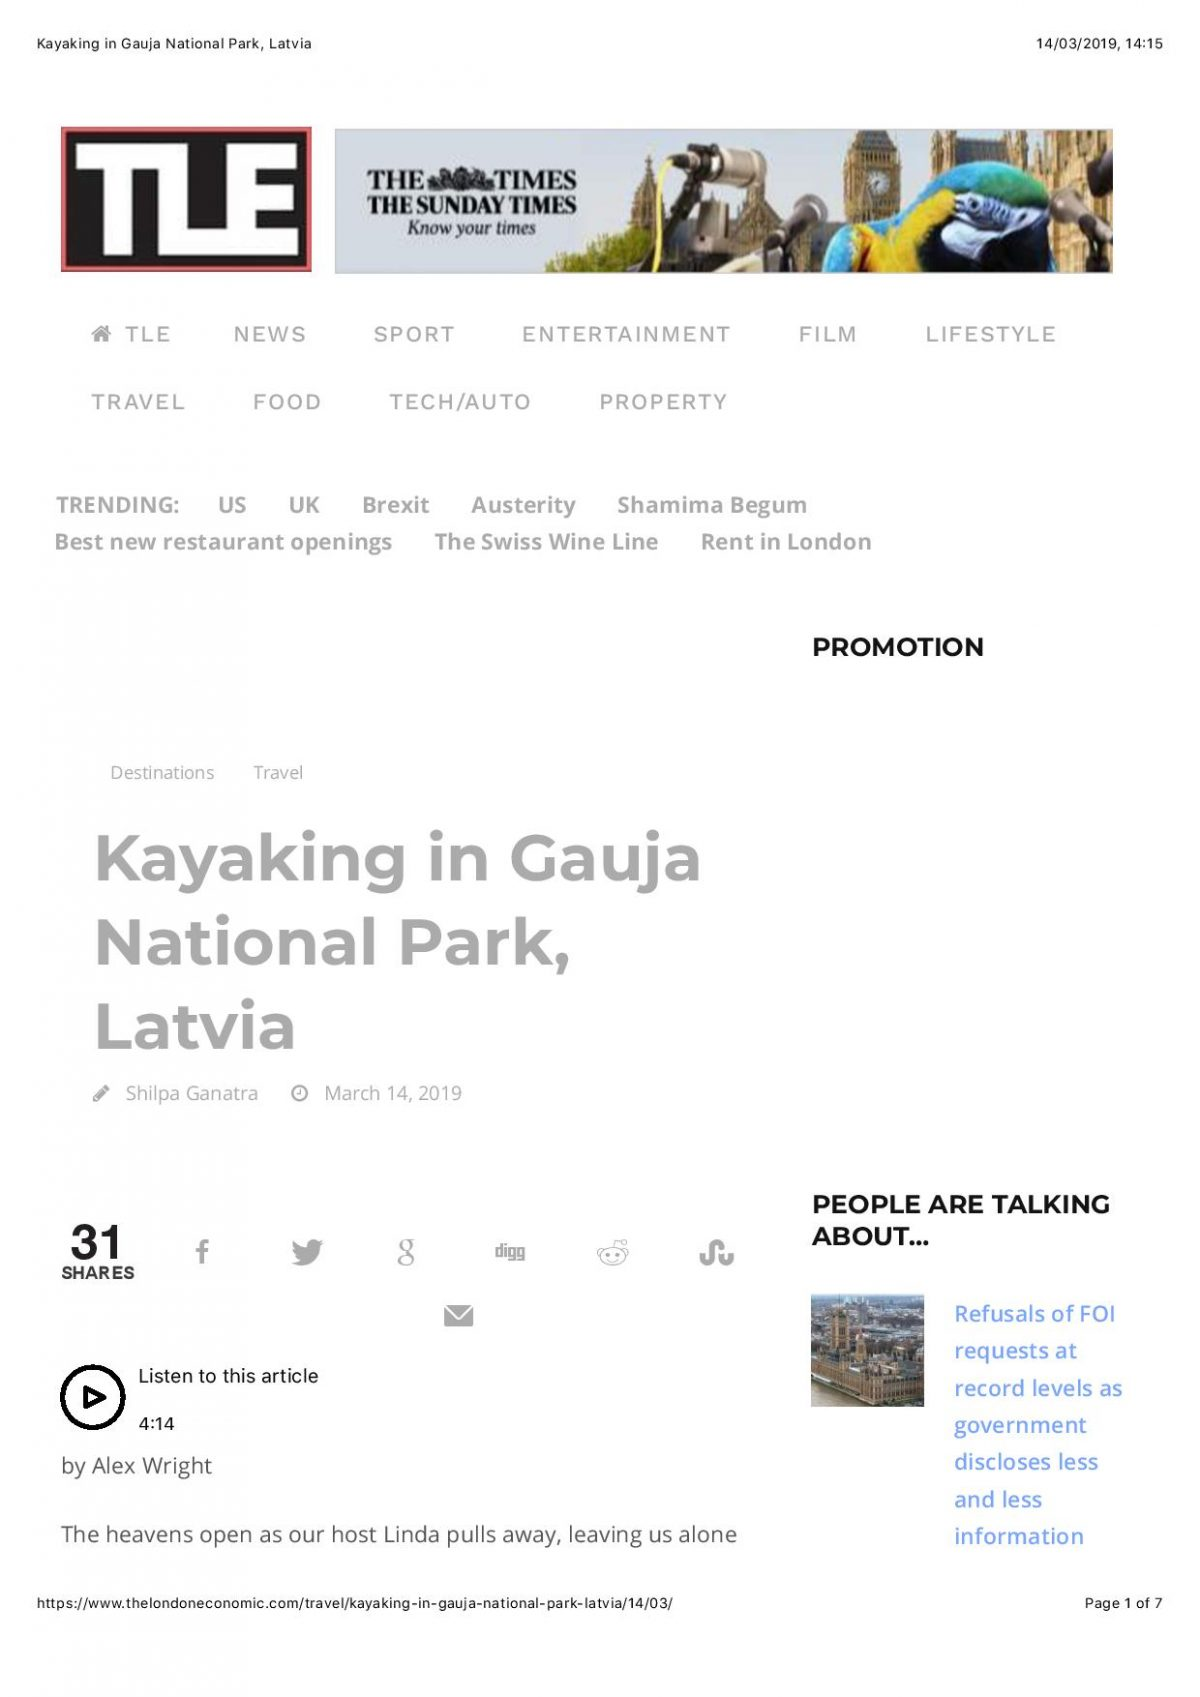 kayaking-in-gauja-national-park-latvia-page-001